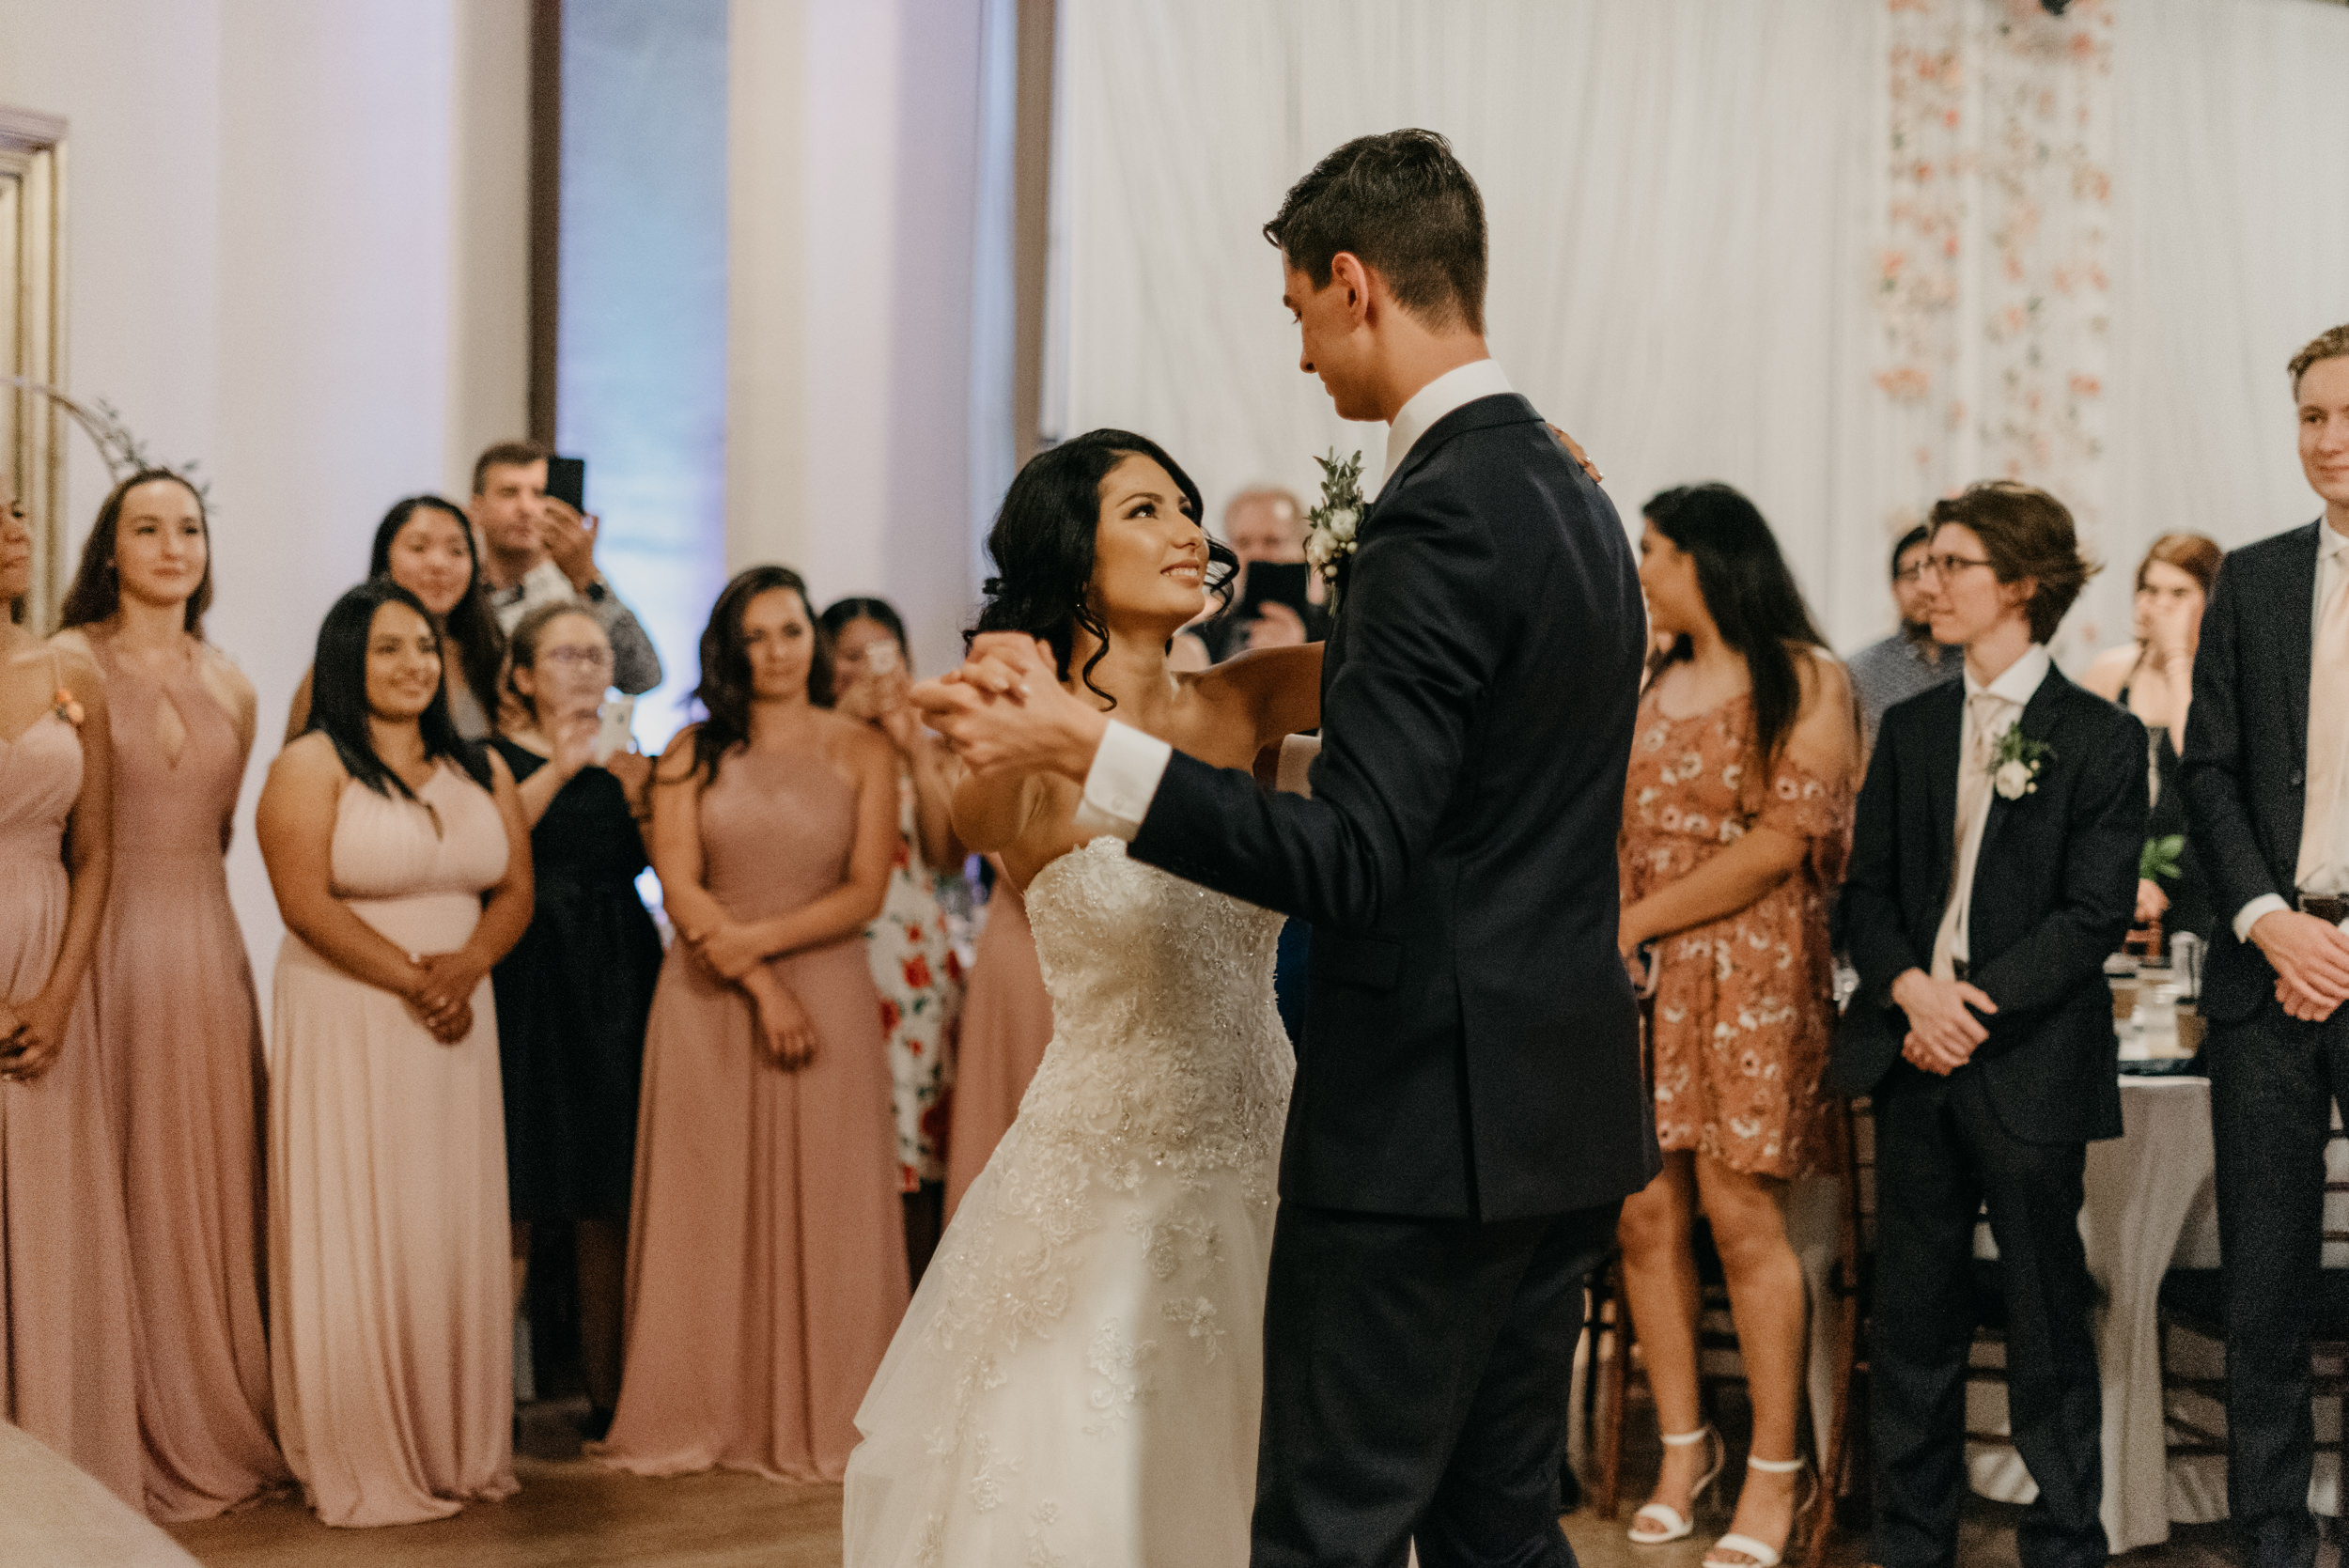 118-reception-west-end-ballroom-portland-wedding-photographer-9796.jpg